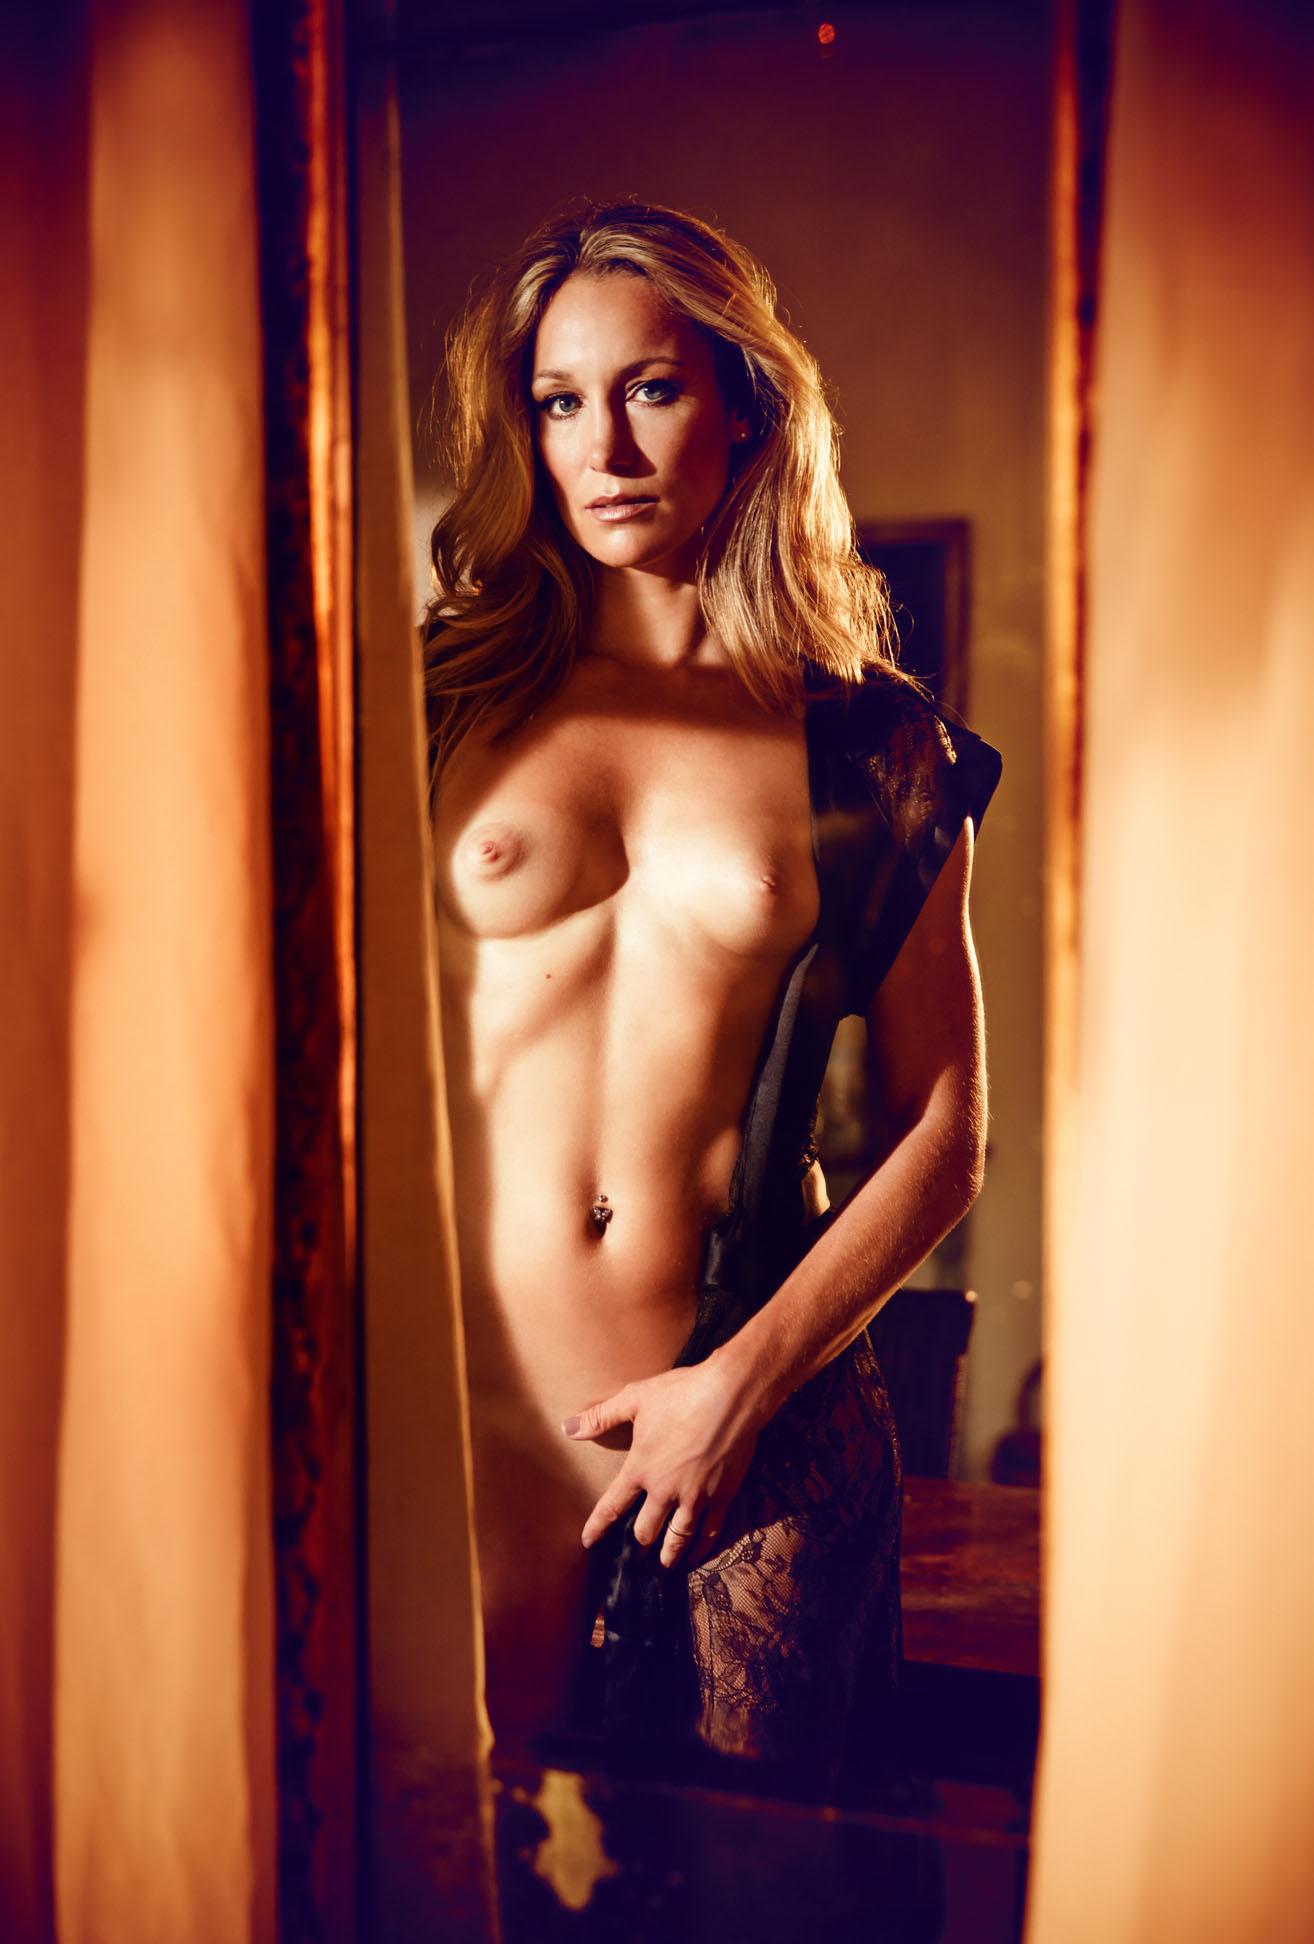 Кристин Тэйсс голая. Фото - 23